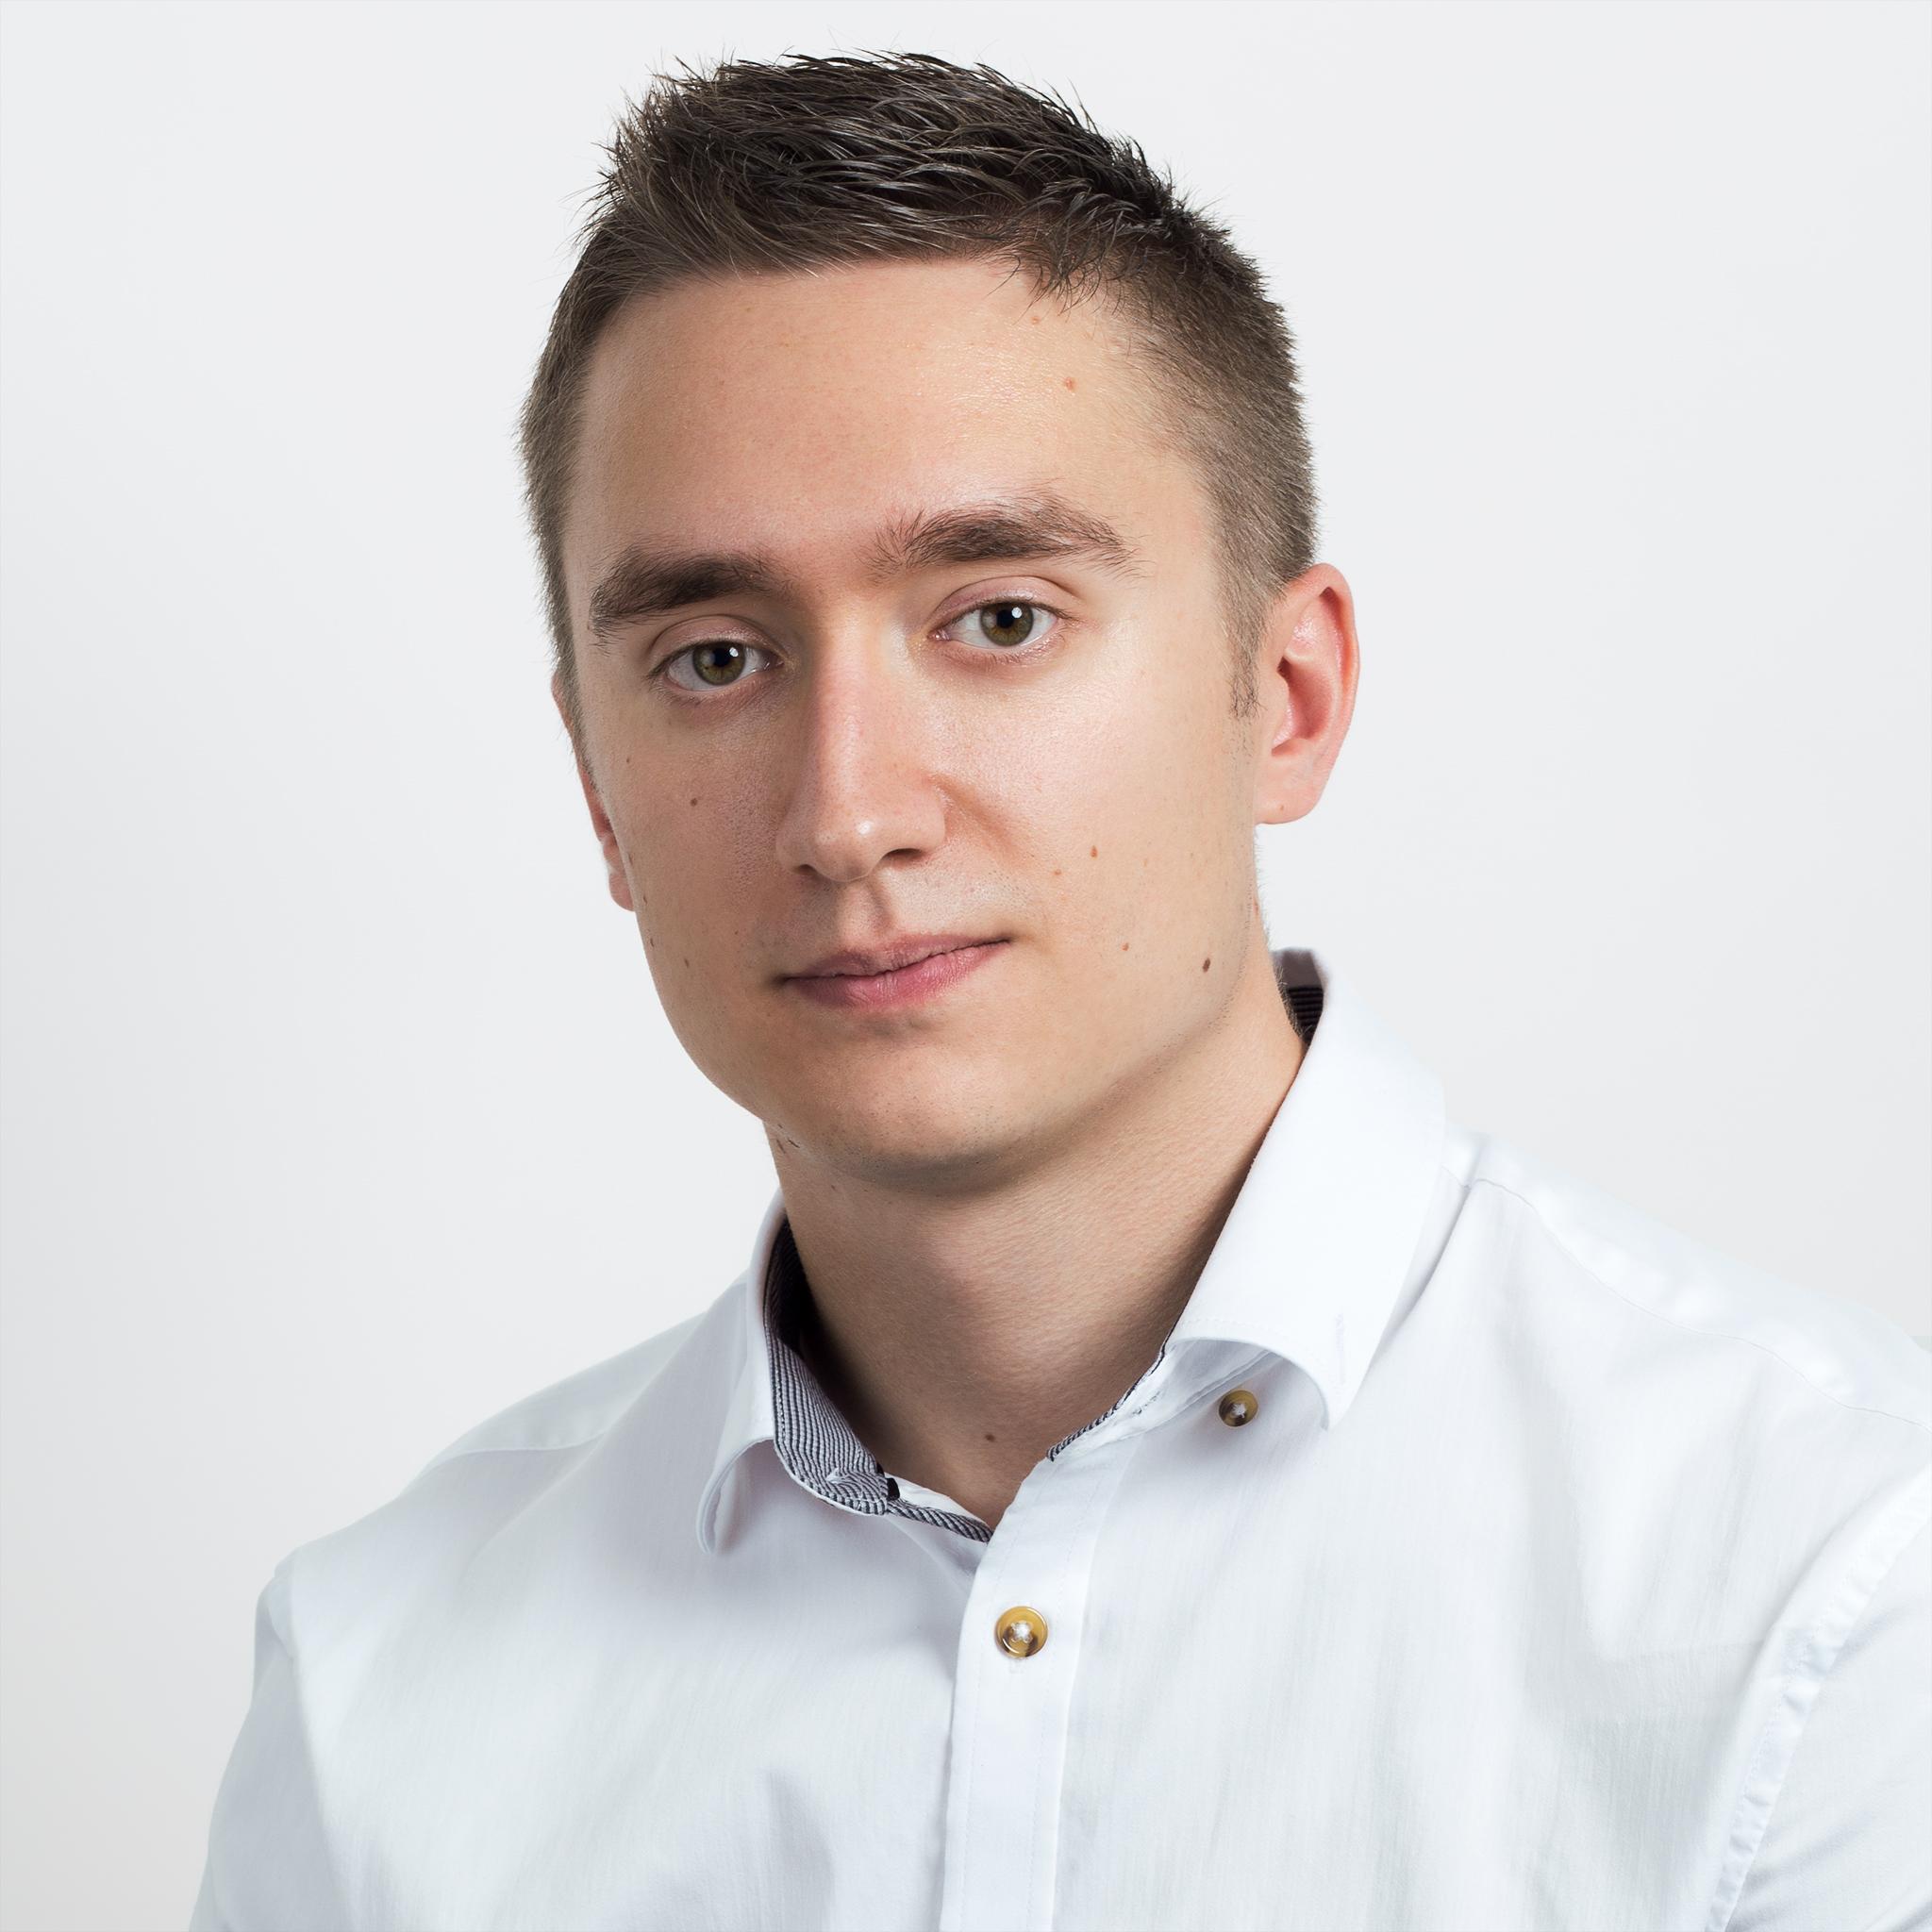 Kristian Bortnik